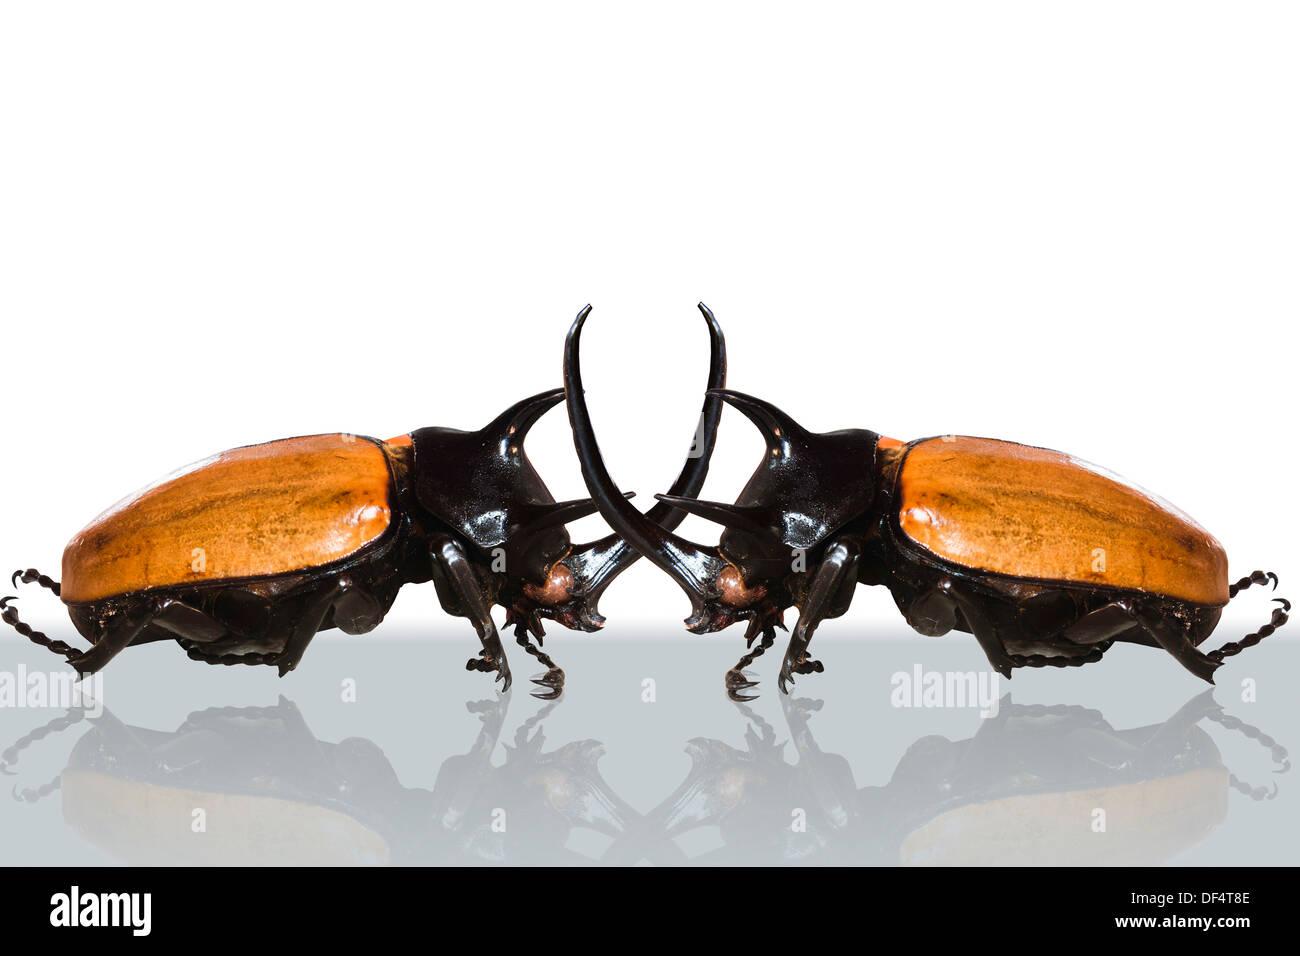 animal, antenna, backgrounds, beauty, beetle, big, bite, black, brown, bug, case, claw, close, closeup, clotures, color, danger - Stock Image